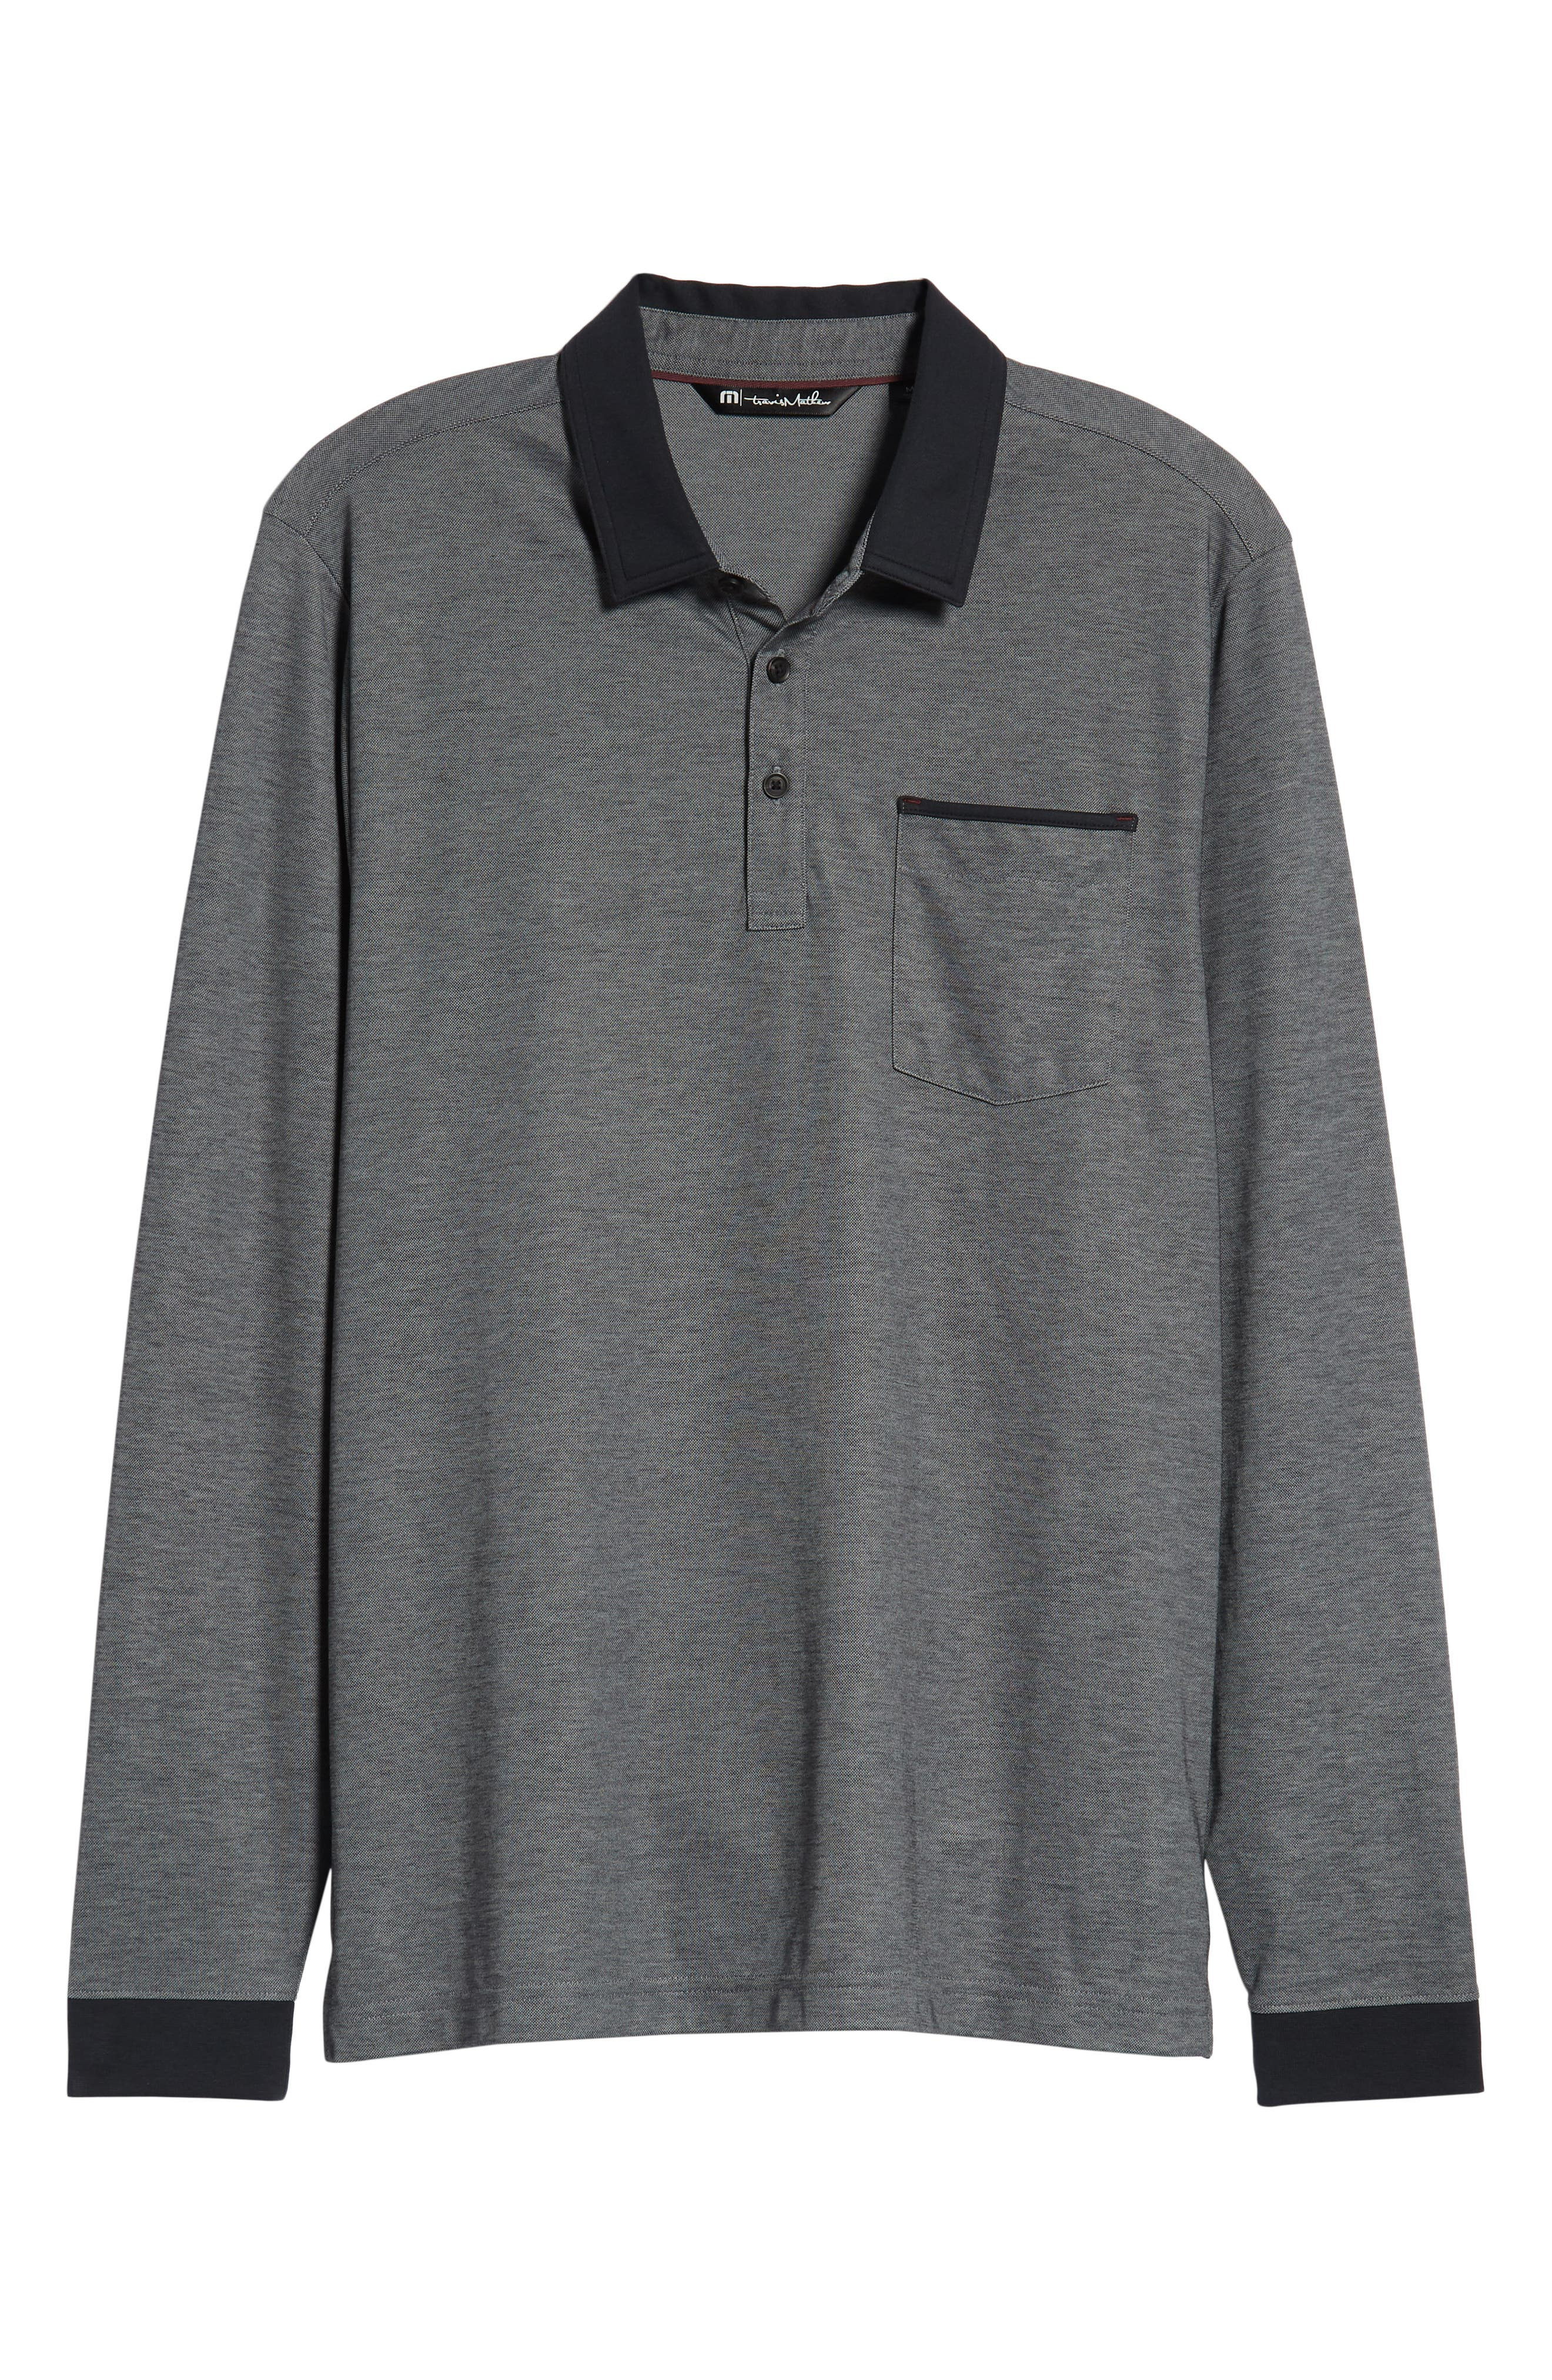 TRAVIS MATHEW,                             Kay Regular Fit Long Sleeve Polo Shirt,                             Alternate thumbnail 6, color,                             020